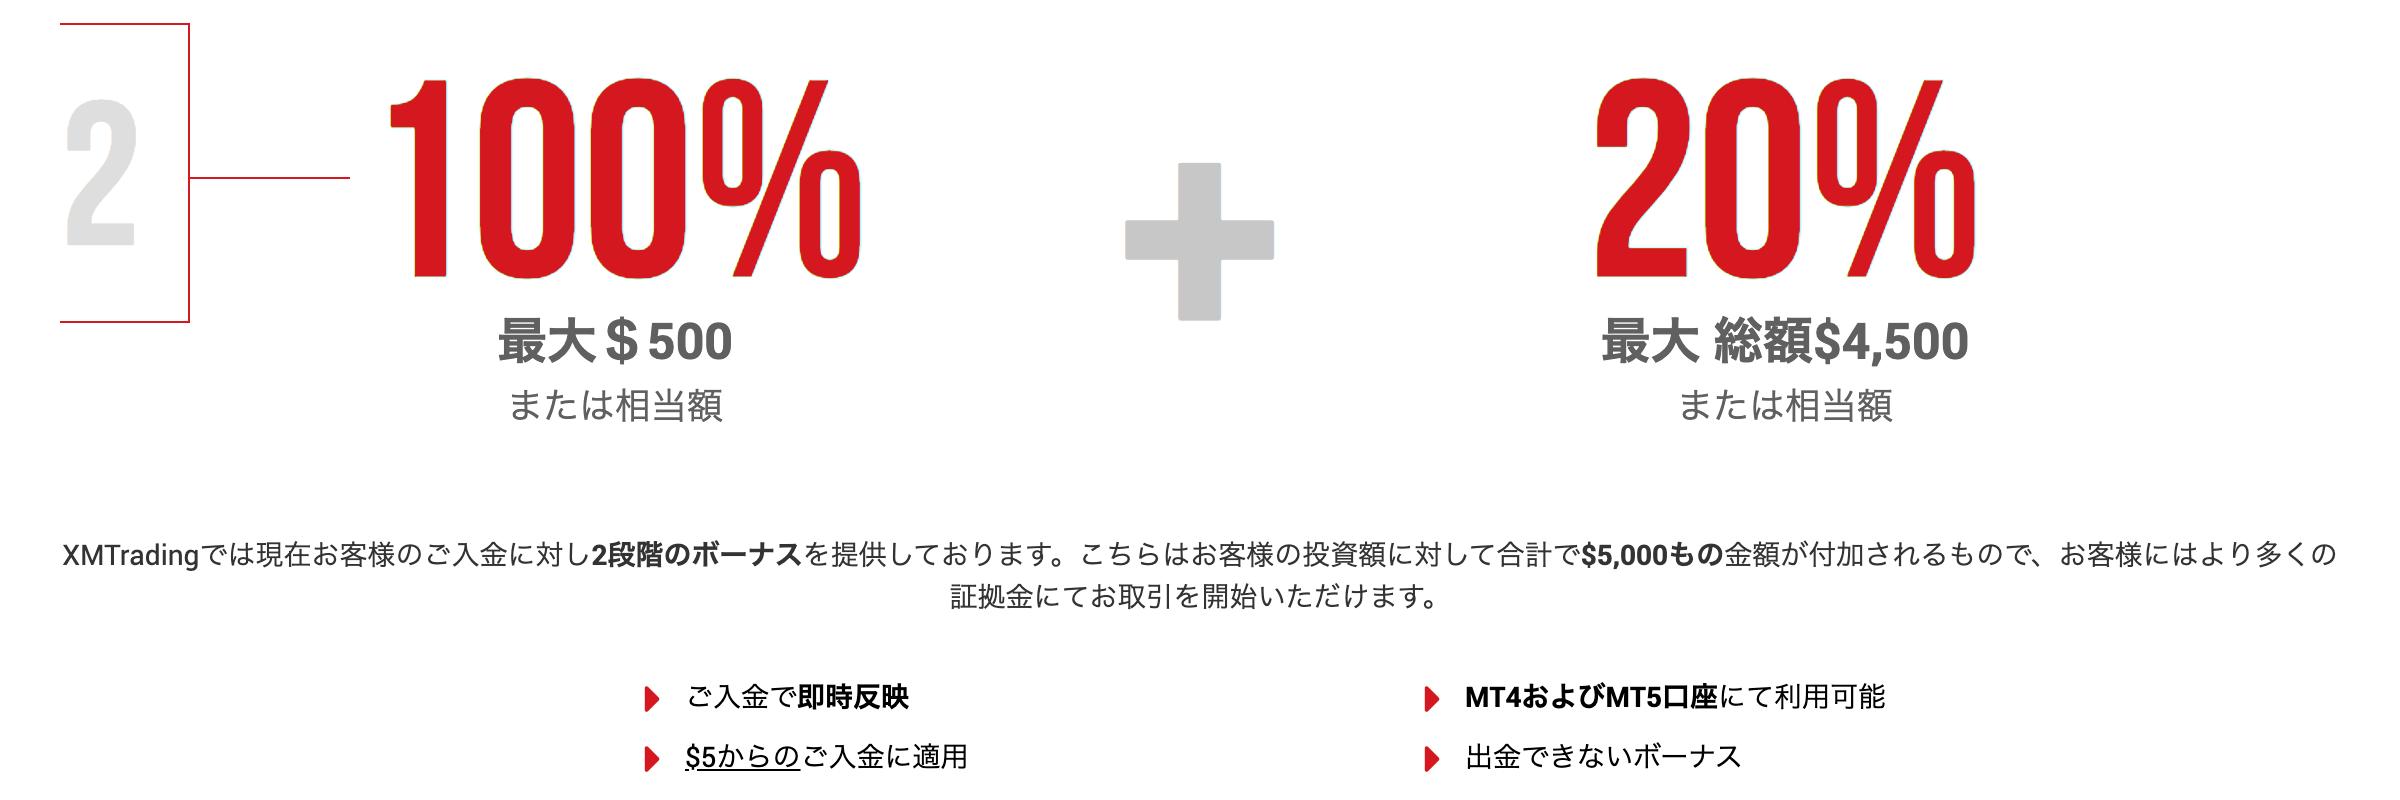 XM入金ボーナス(最大50万円)